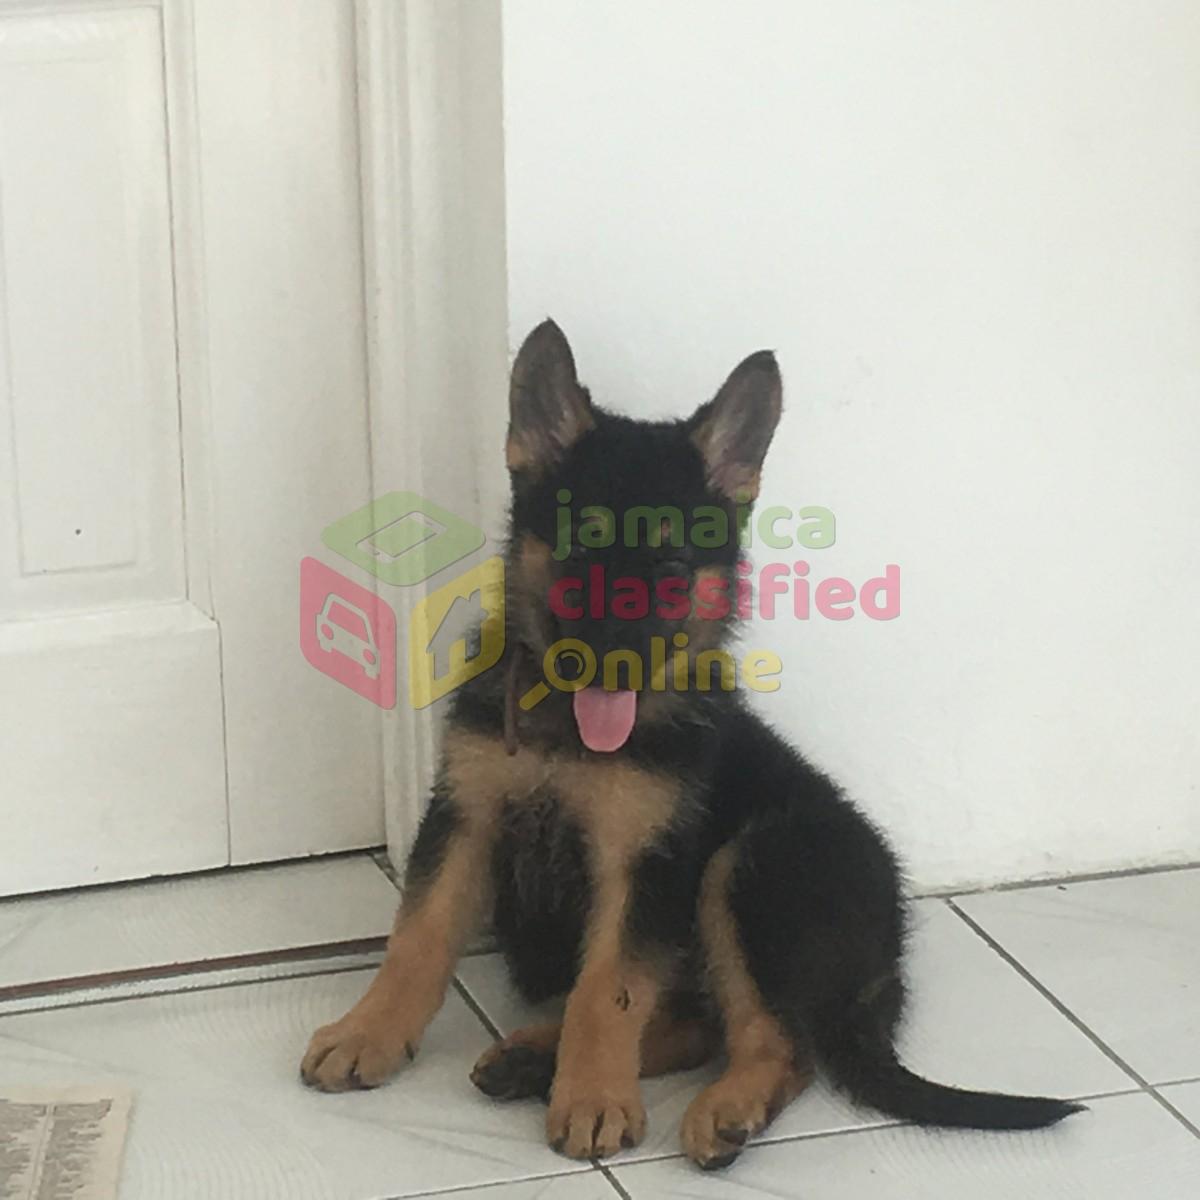 German Shepherd Puppy for sale in Oracabessa St Mary - Dogs